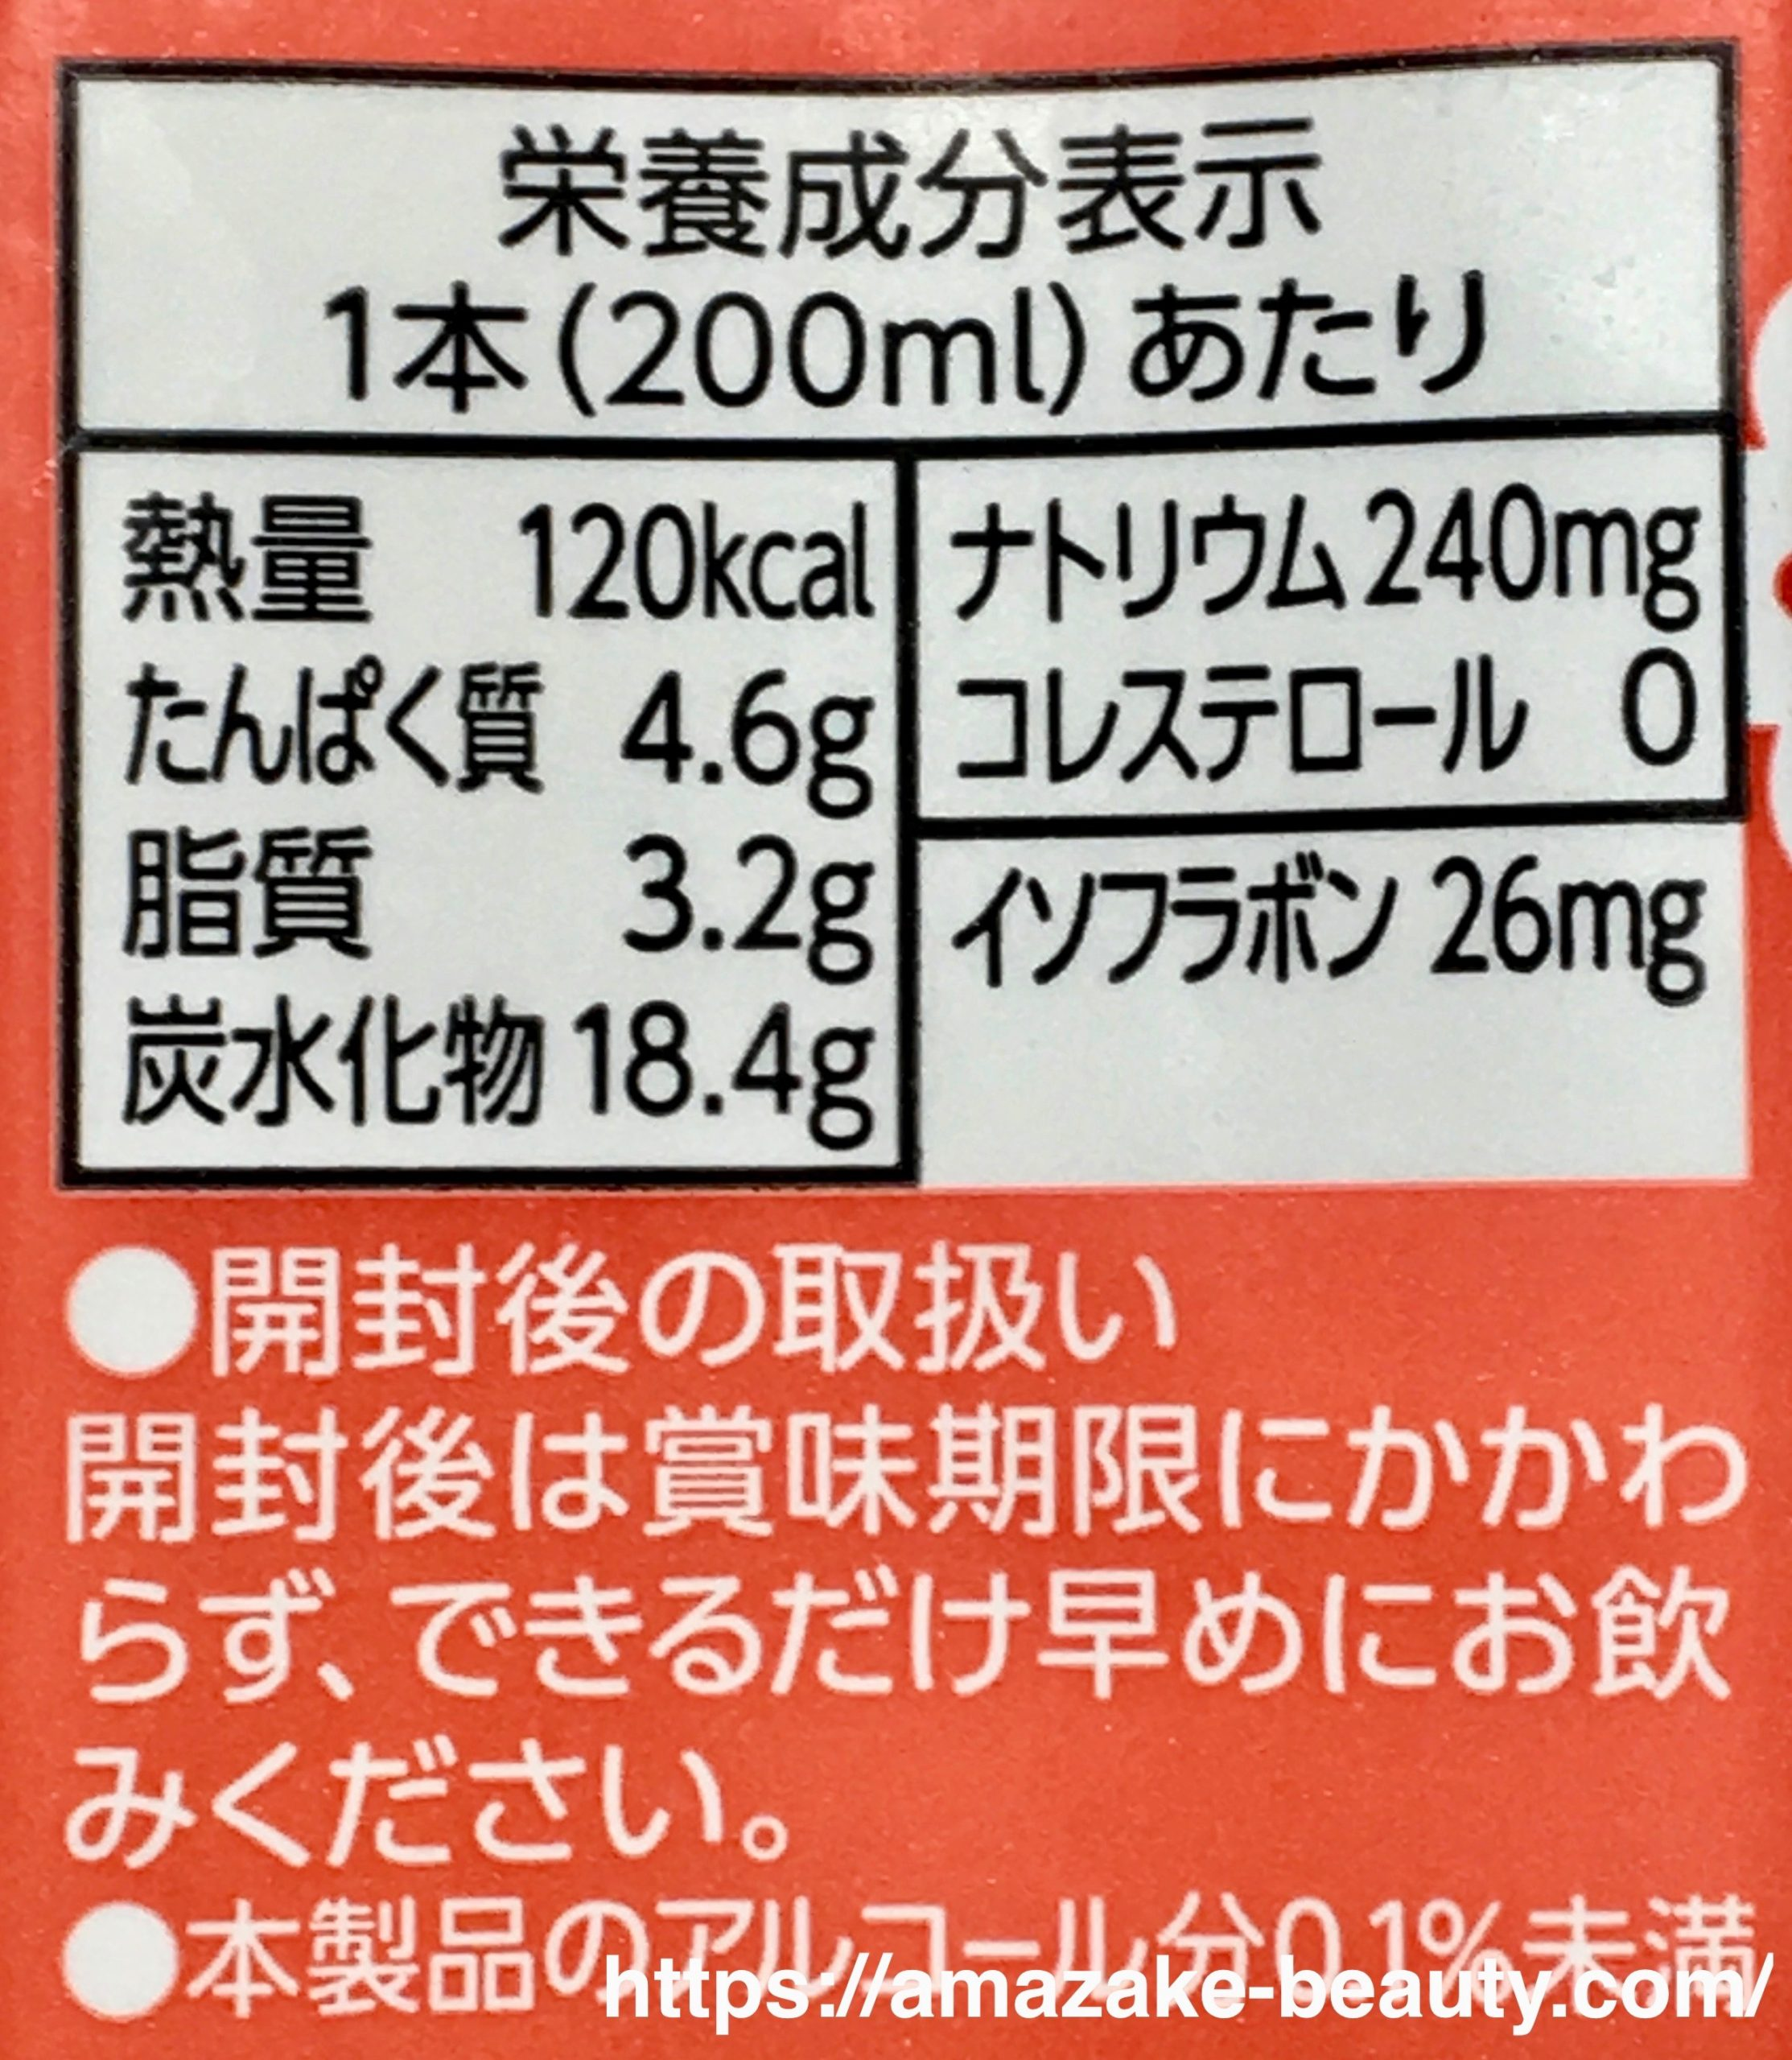 【甘酒】キッコーマン『豆乳飲料 甘酒』(栄養成分表示)